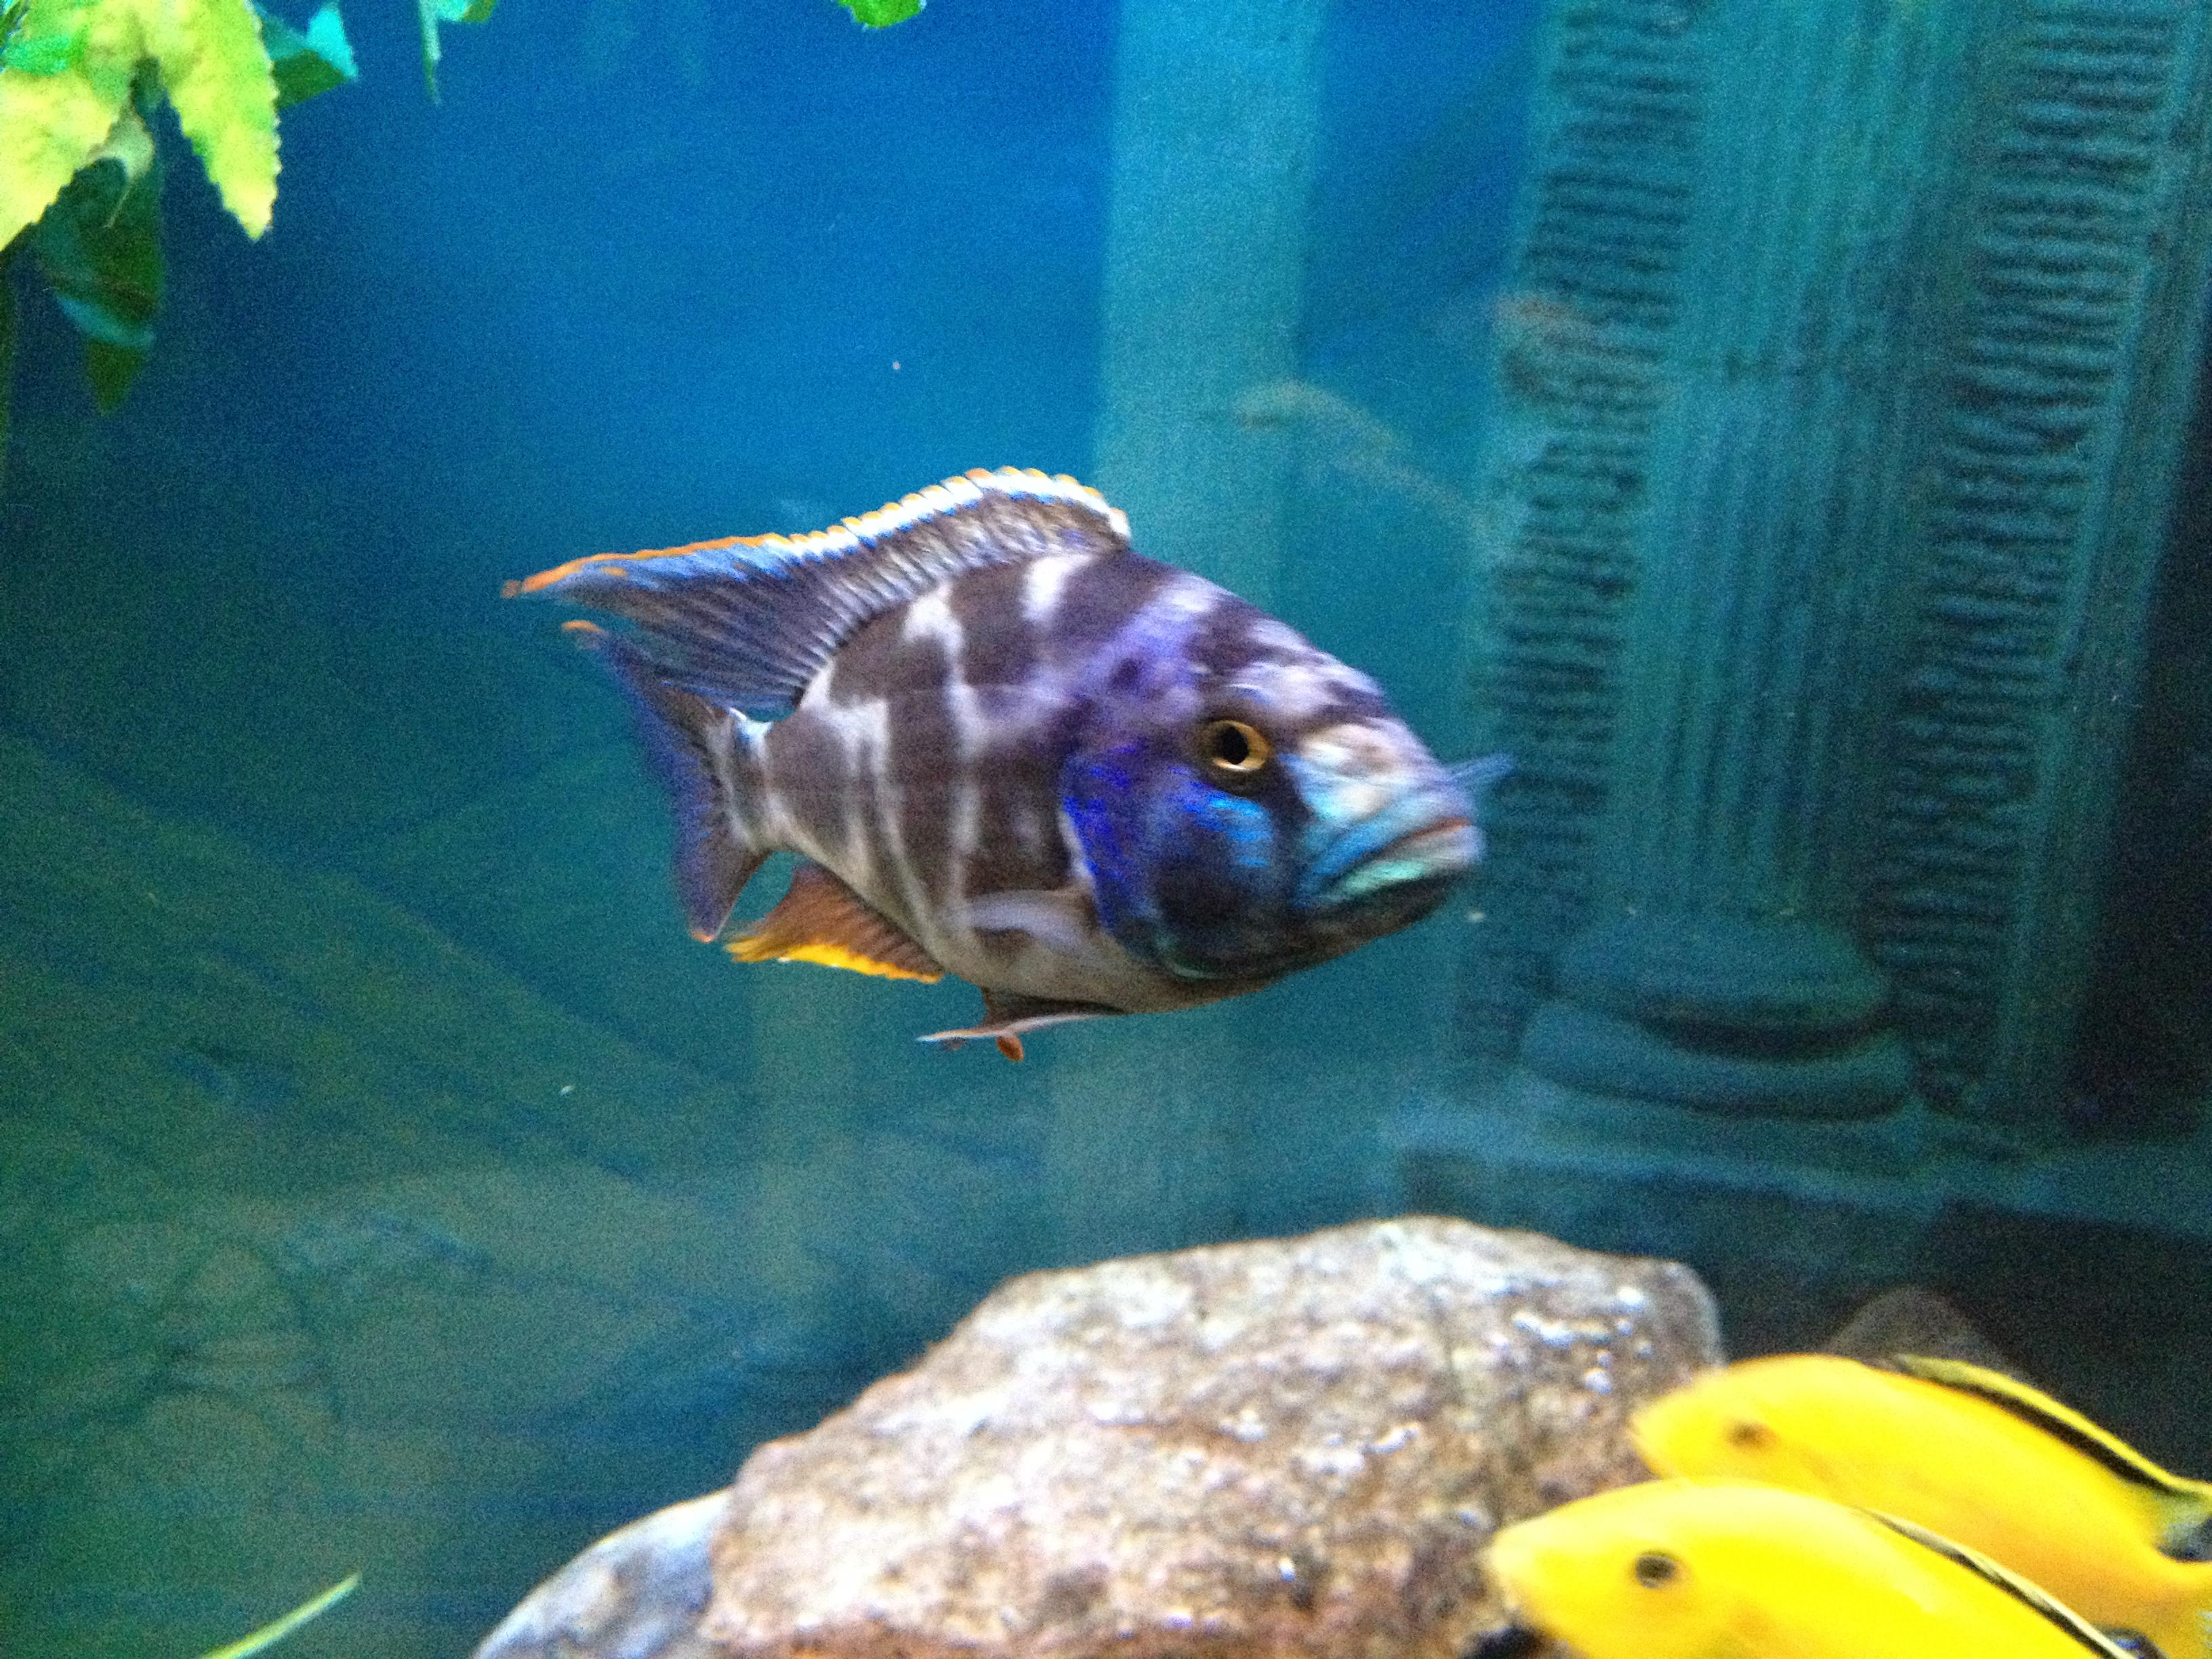 cichlids.com: nimbochromis livingstonii male